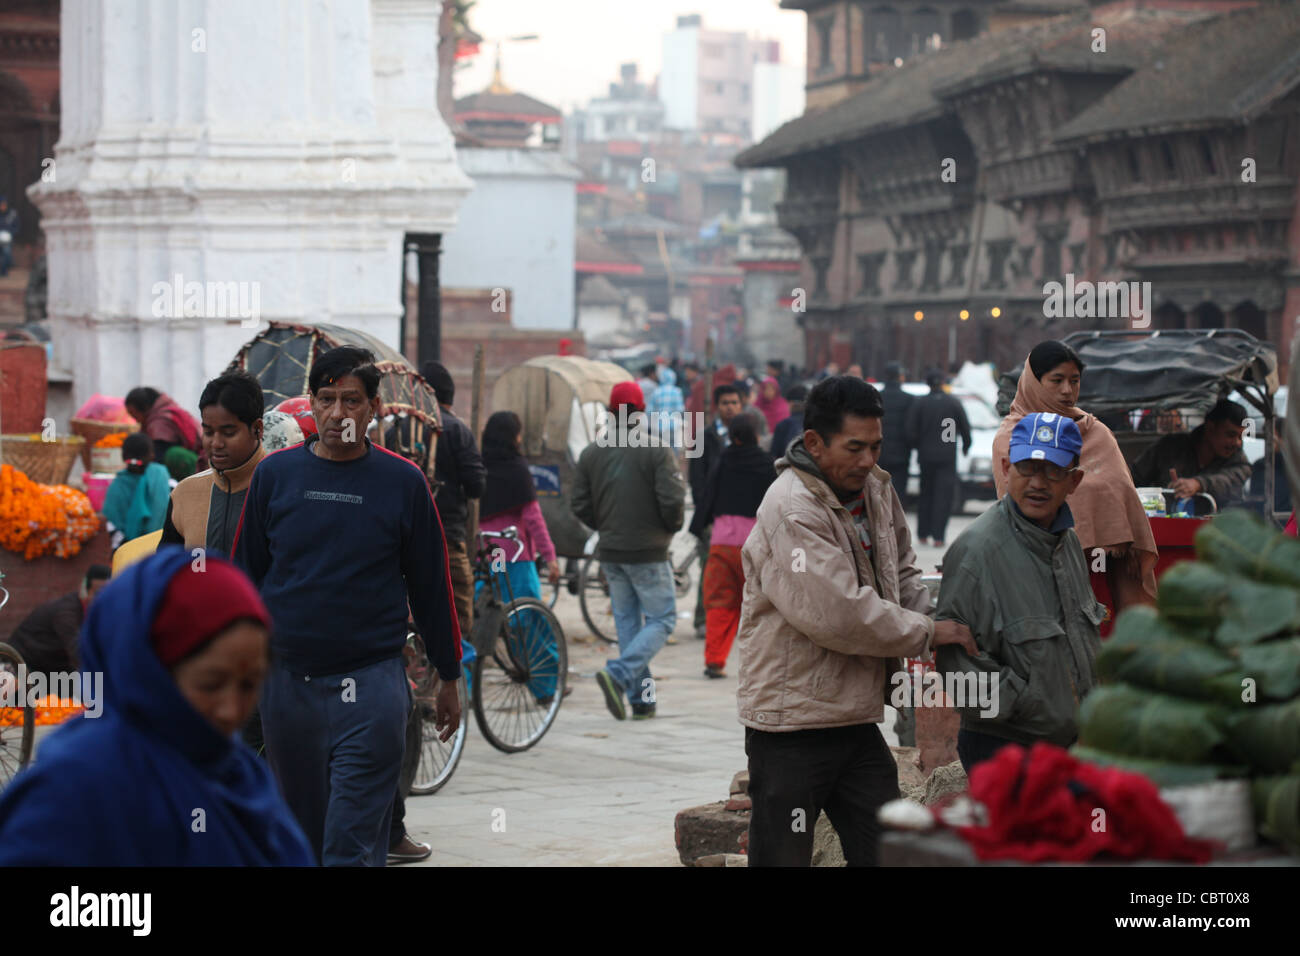 Vegetable Market in Durbar Square, Kathmandhu - Stock Image